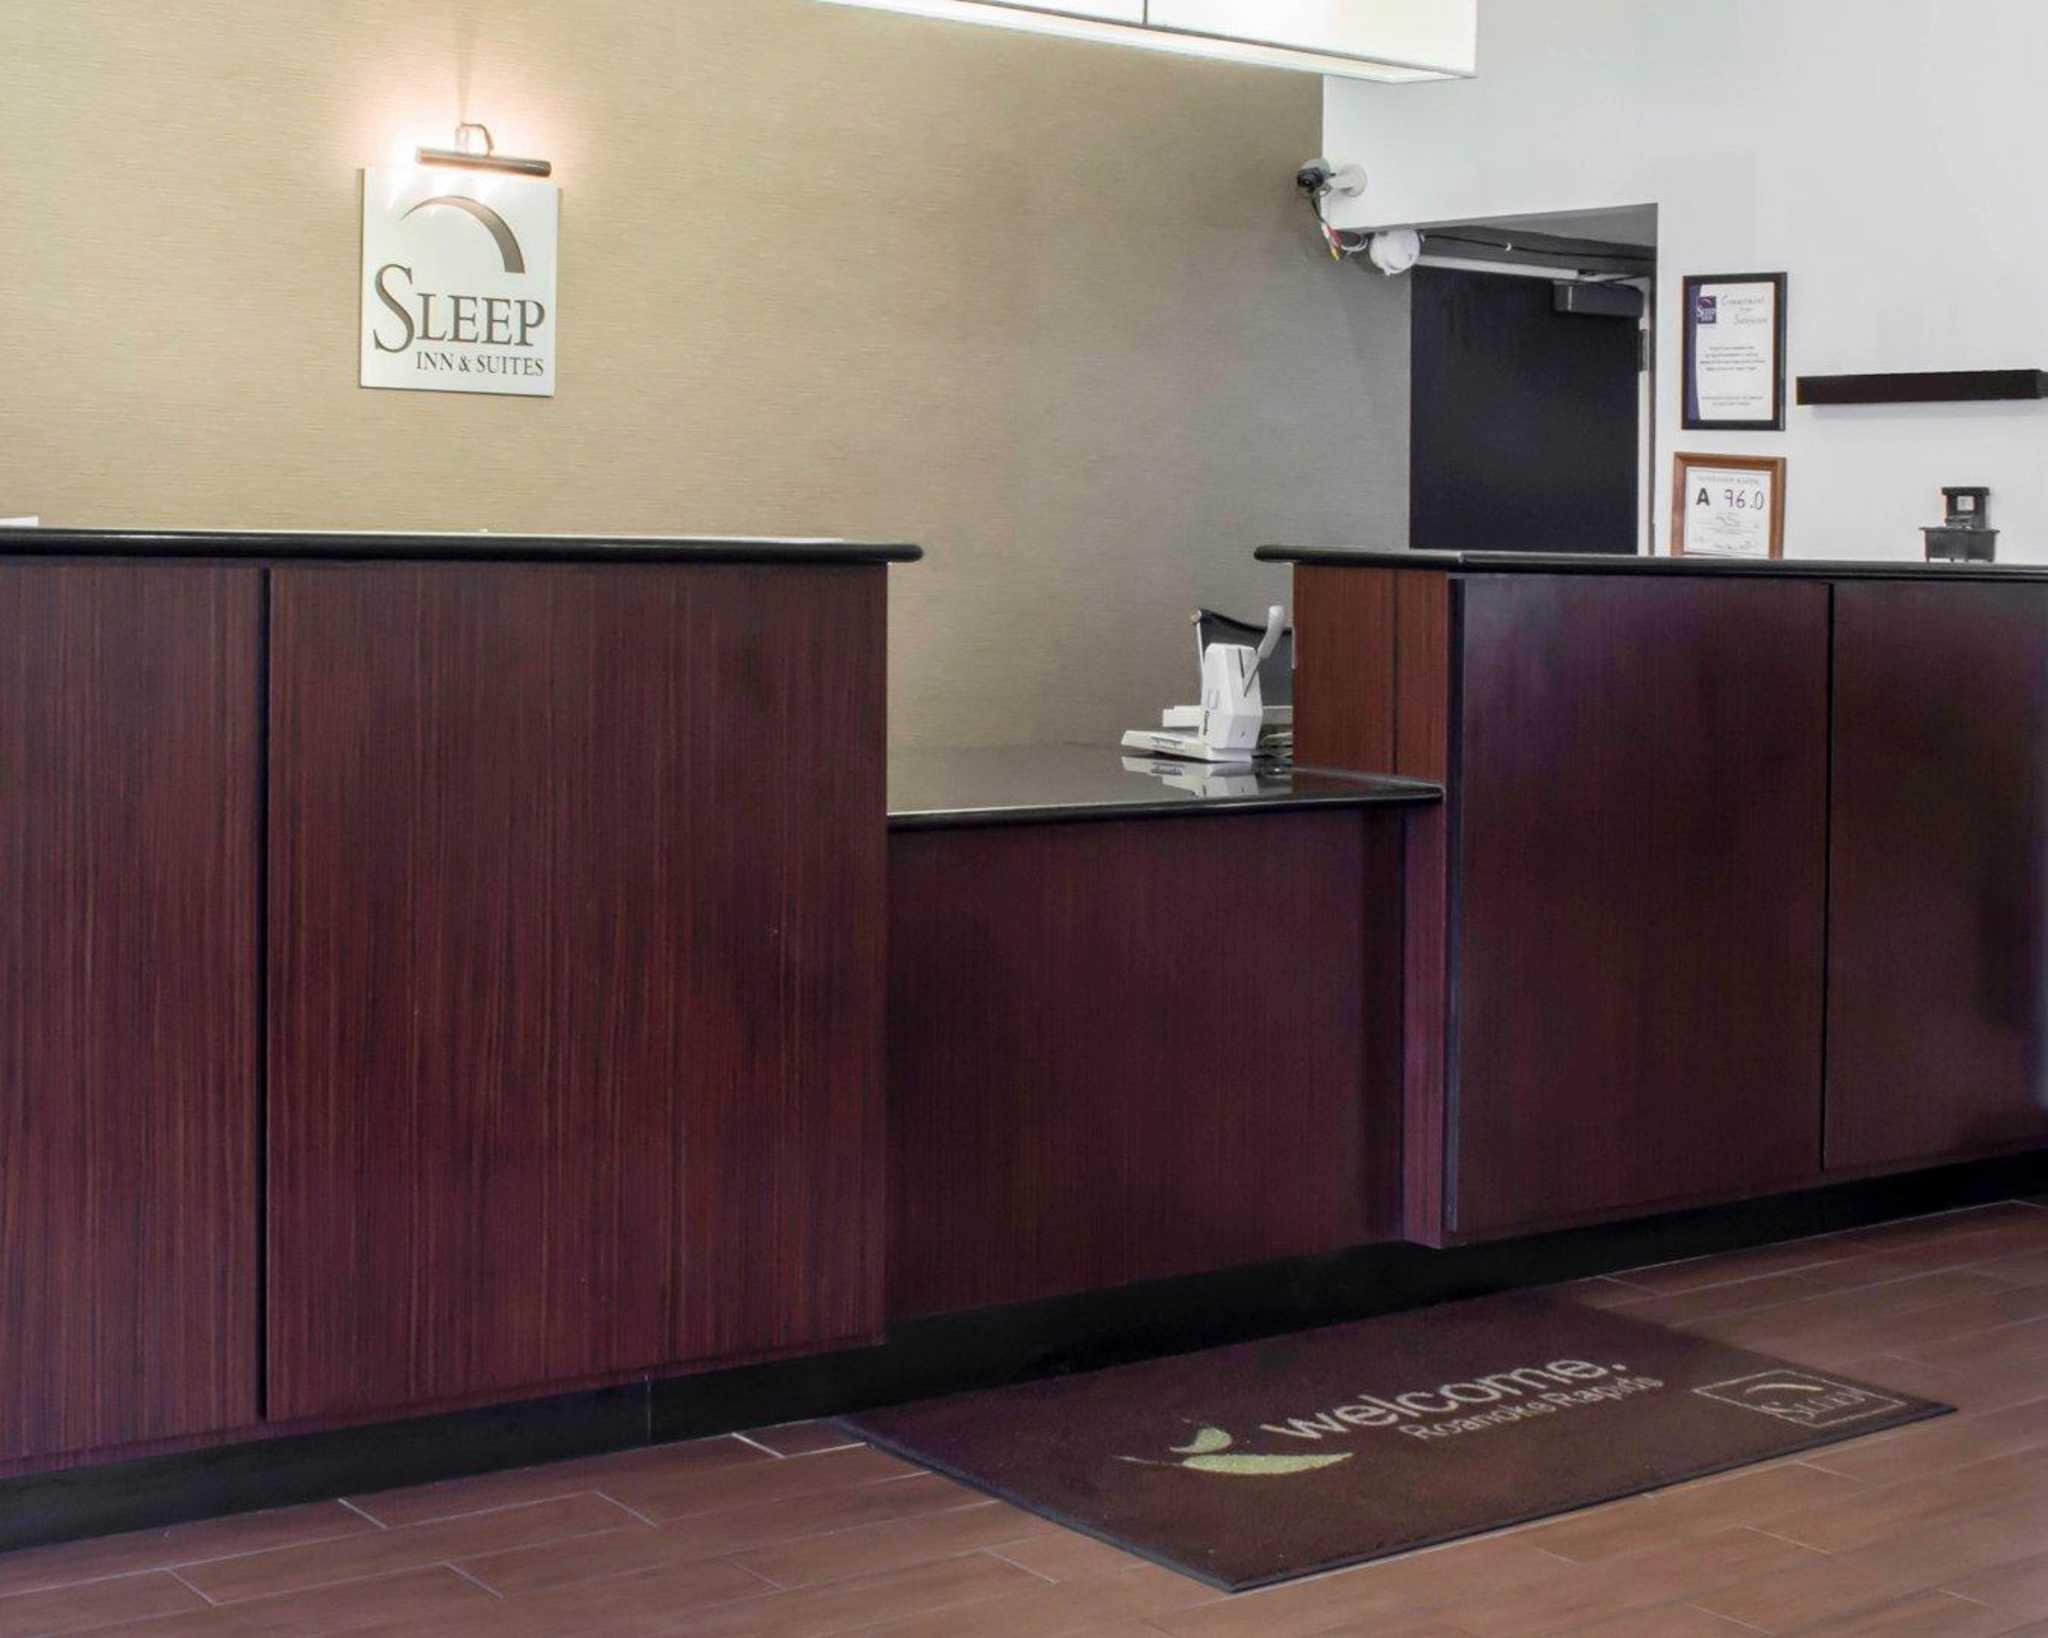 Sleep Inn & Suites near Halifax Regional Medical Center image 14